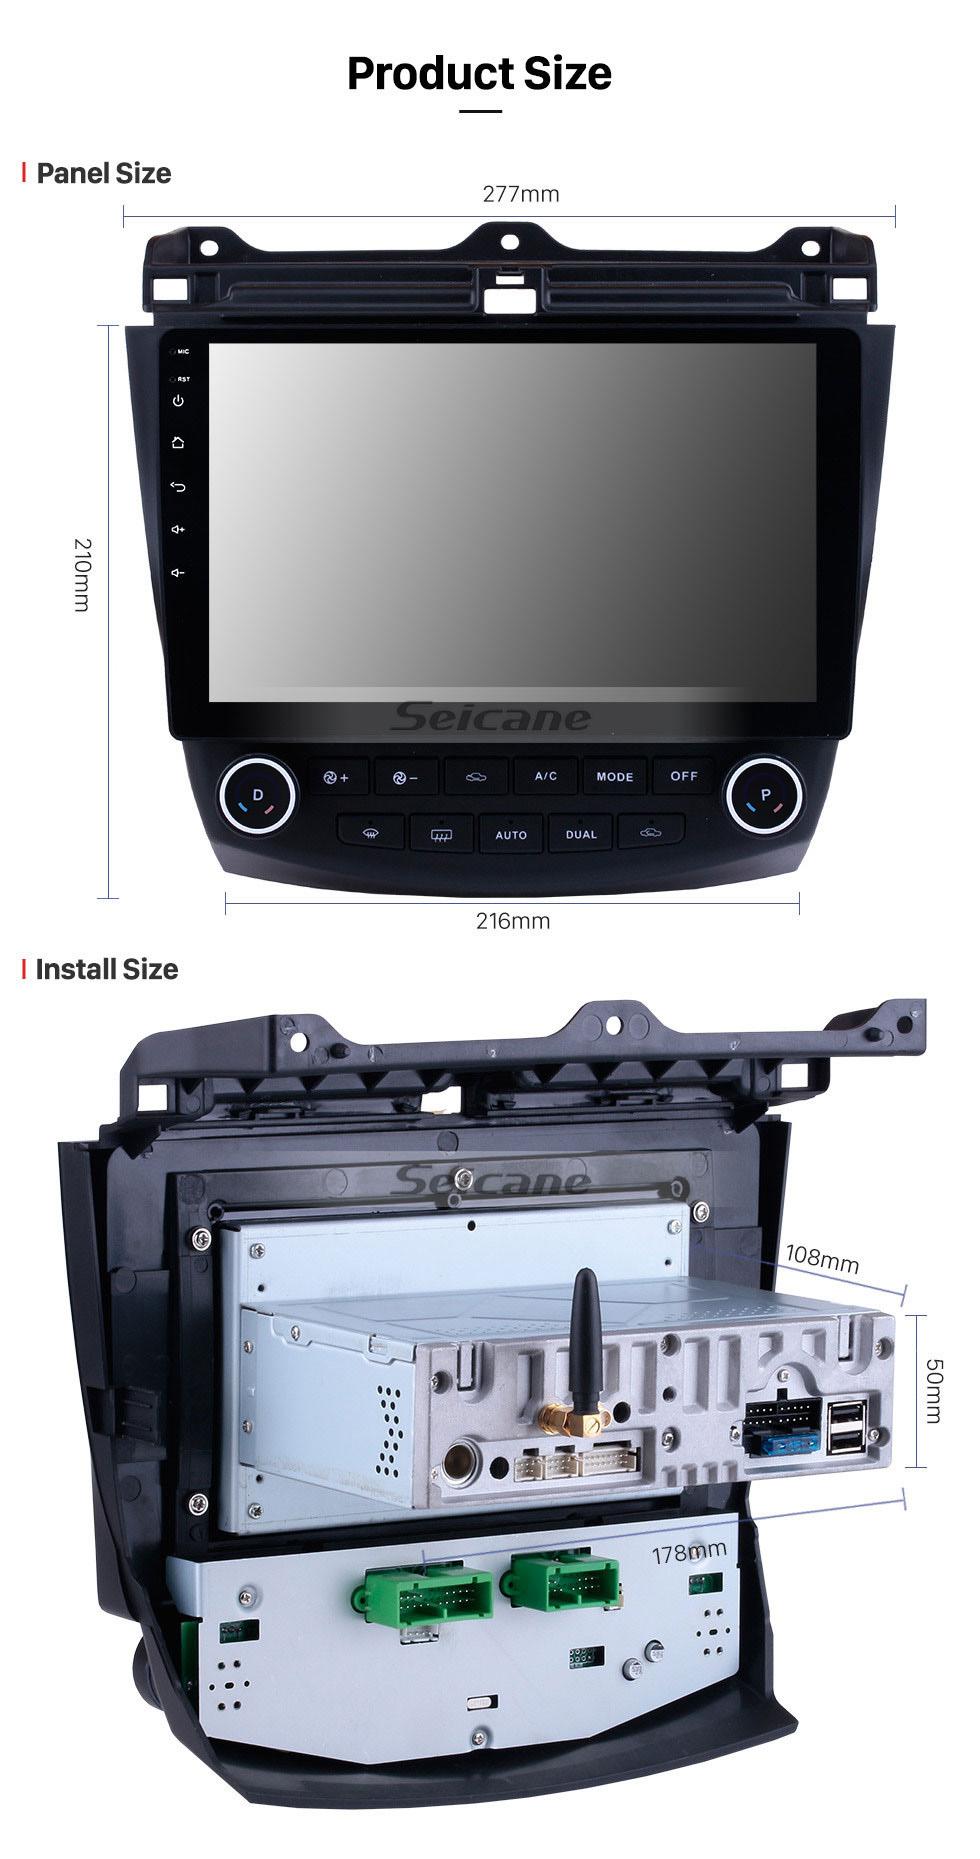 Seicane 10,1 дюймовый HD 1024 * 600 Сенсорный экран 2003 2004 2005 2006 2007 Honda Accord 7 Android 9.0 Радио GPS-навигация Bluetooth USB WIFI 1080P Поддержка OBD2 DVR Камера заднего вида